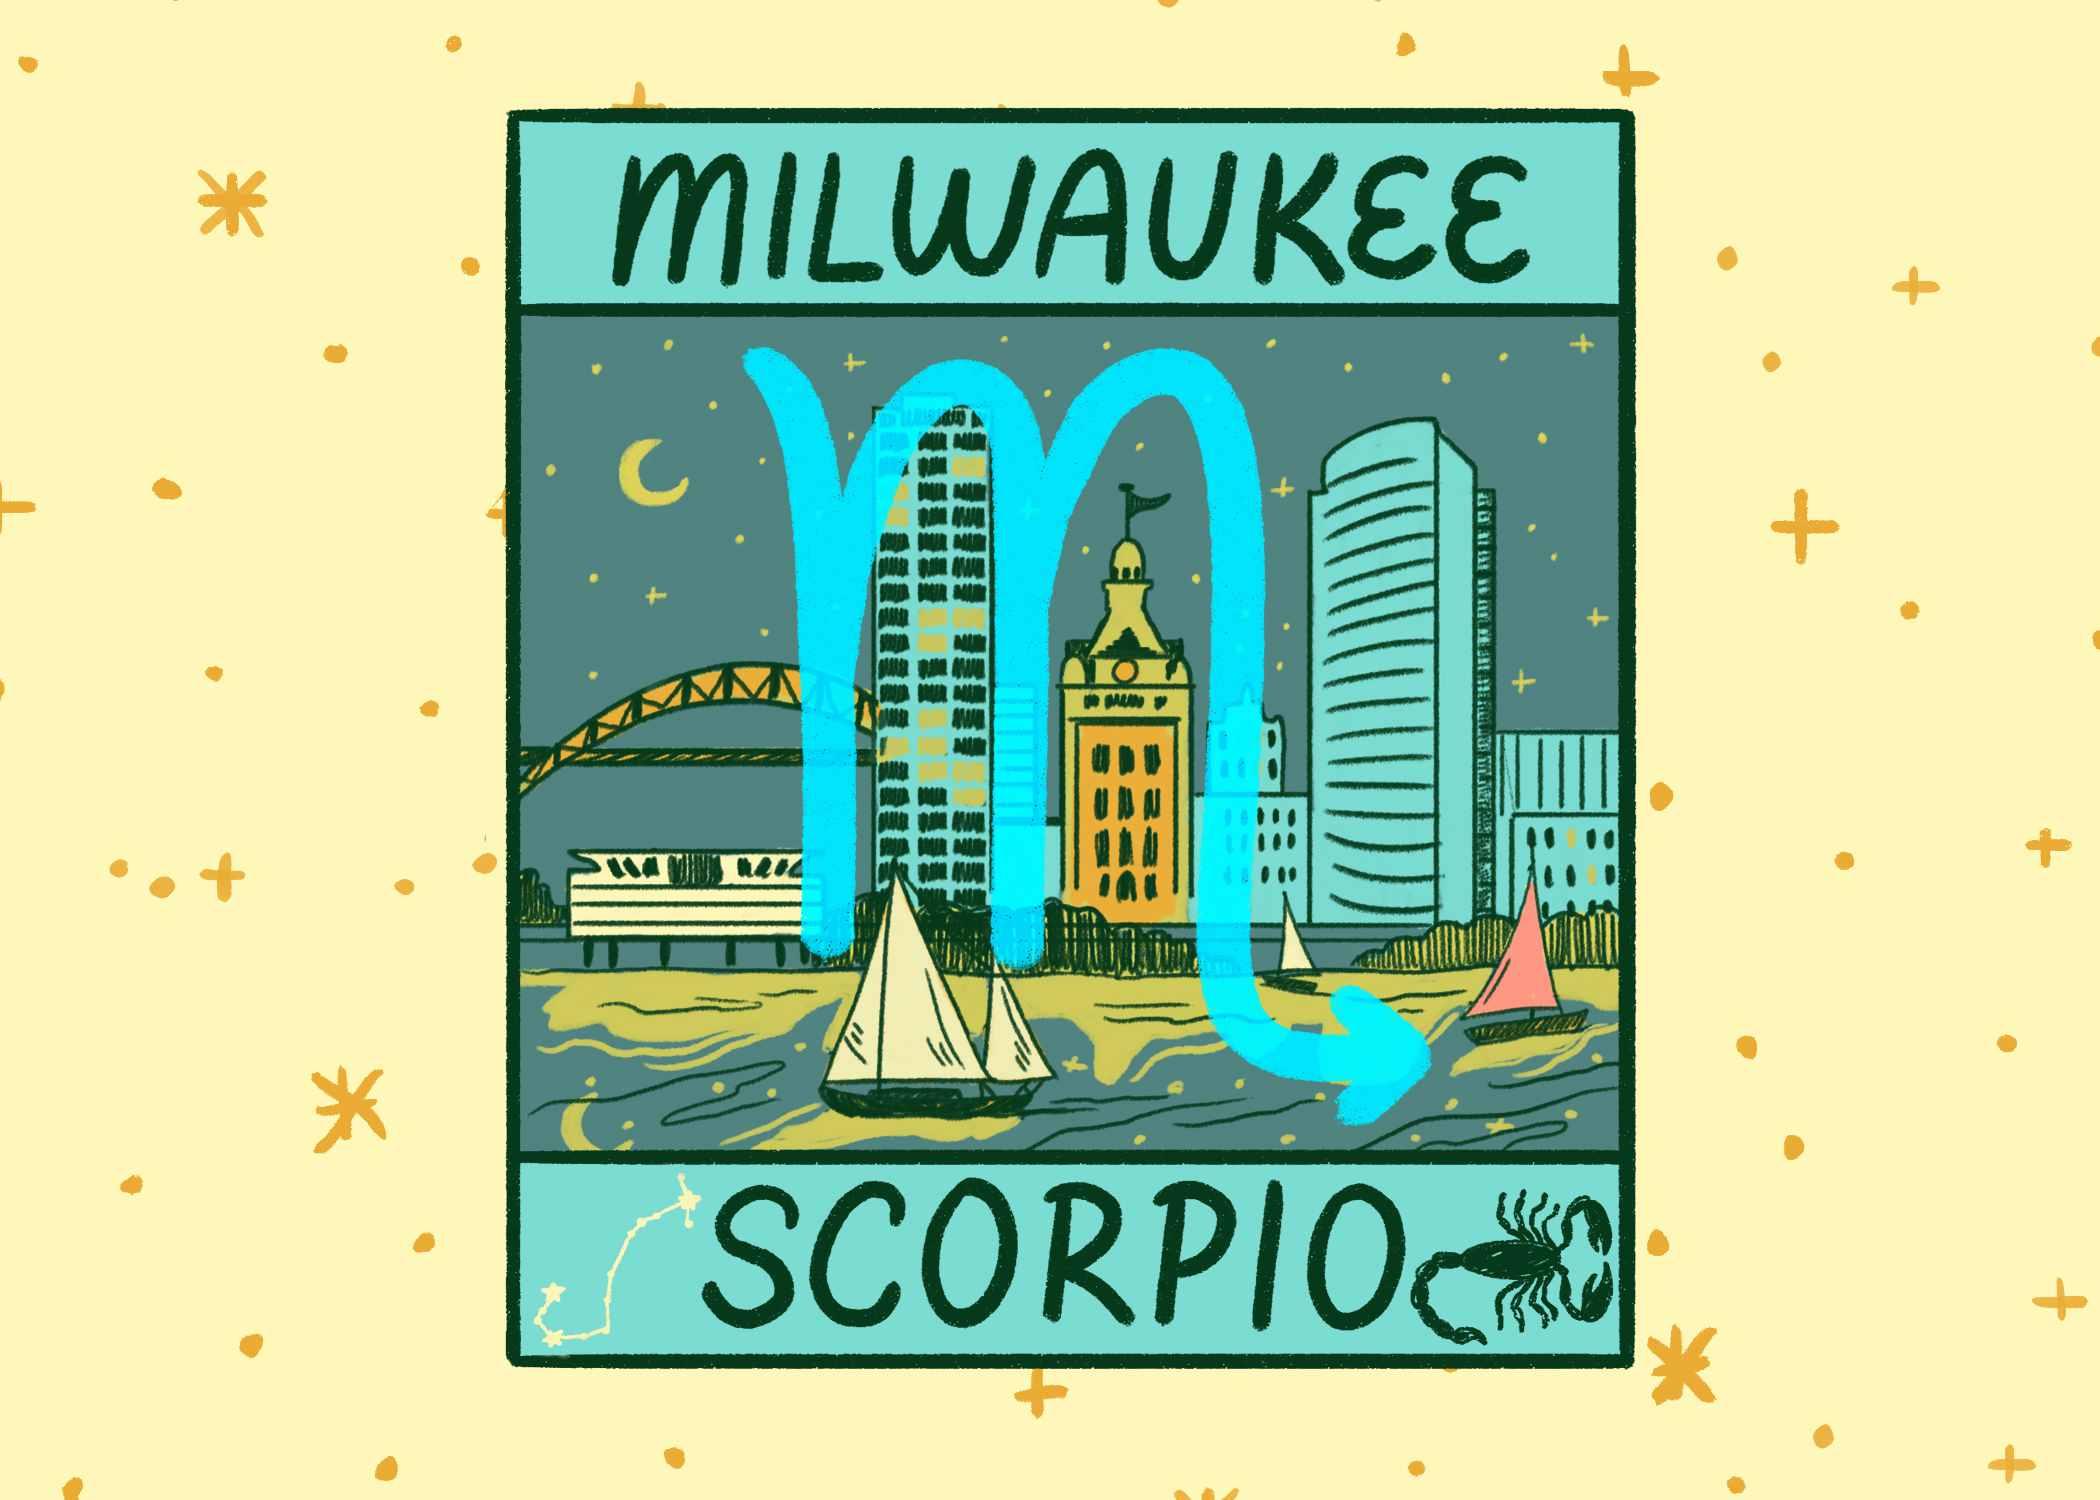 Illustration of Milwaukee and Scorpio